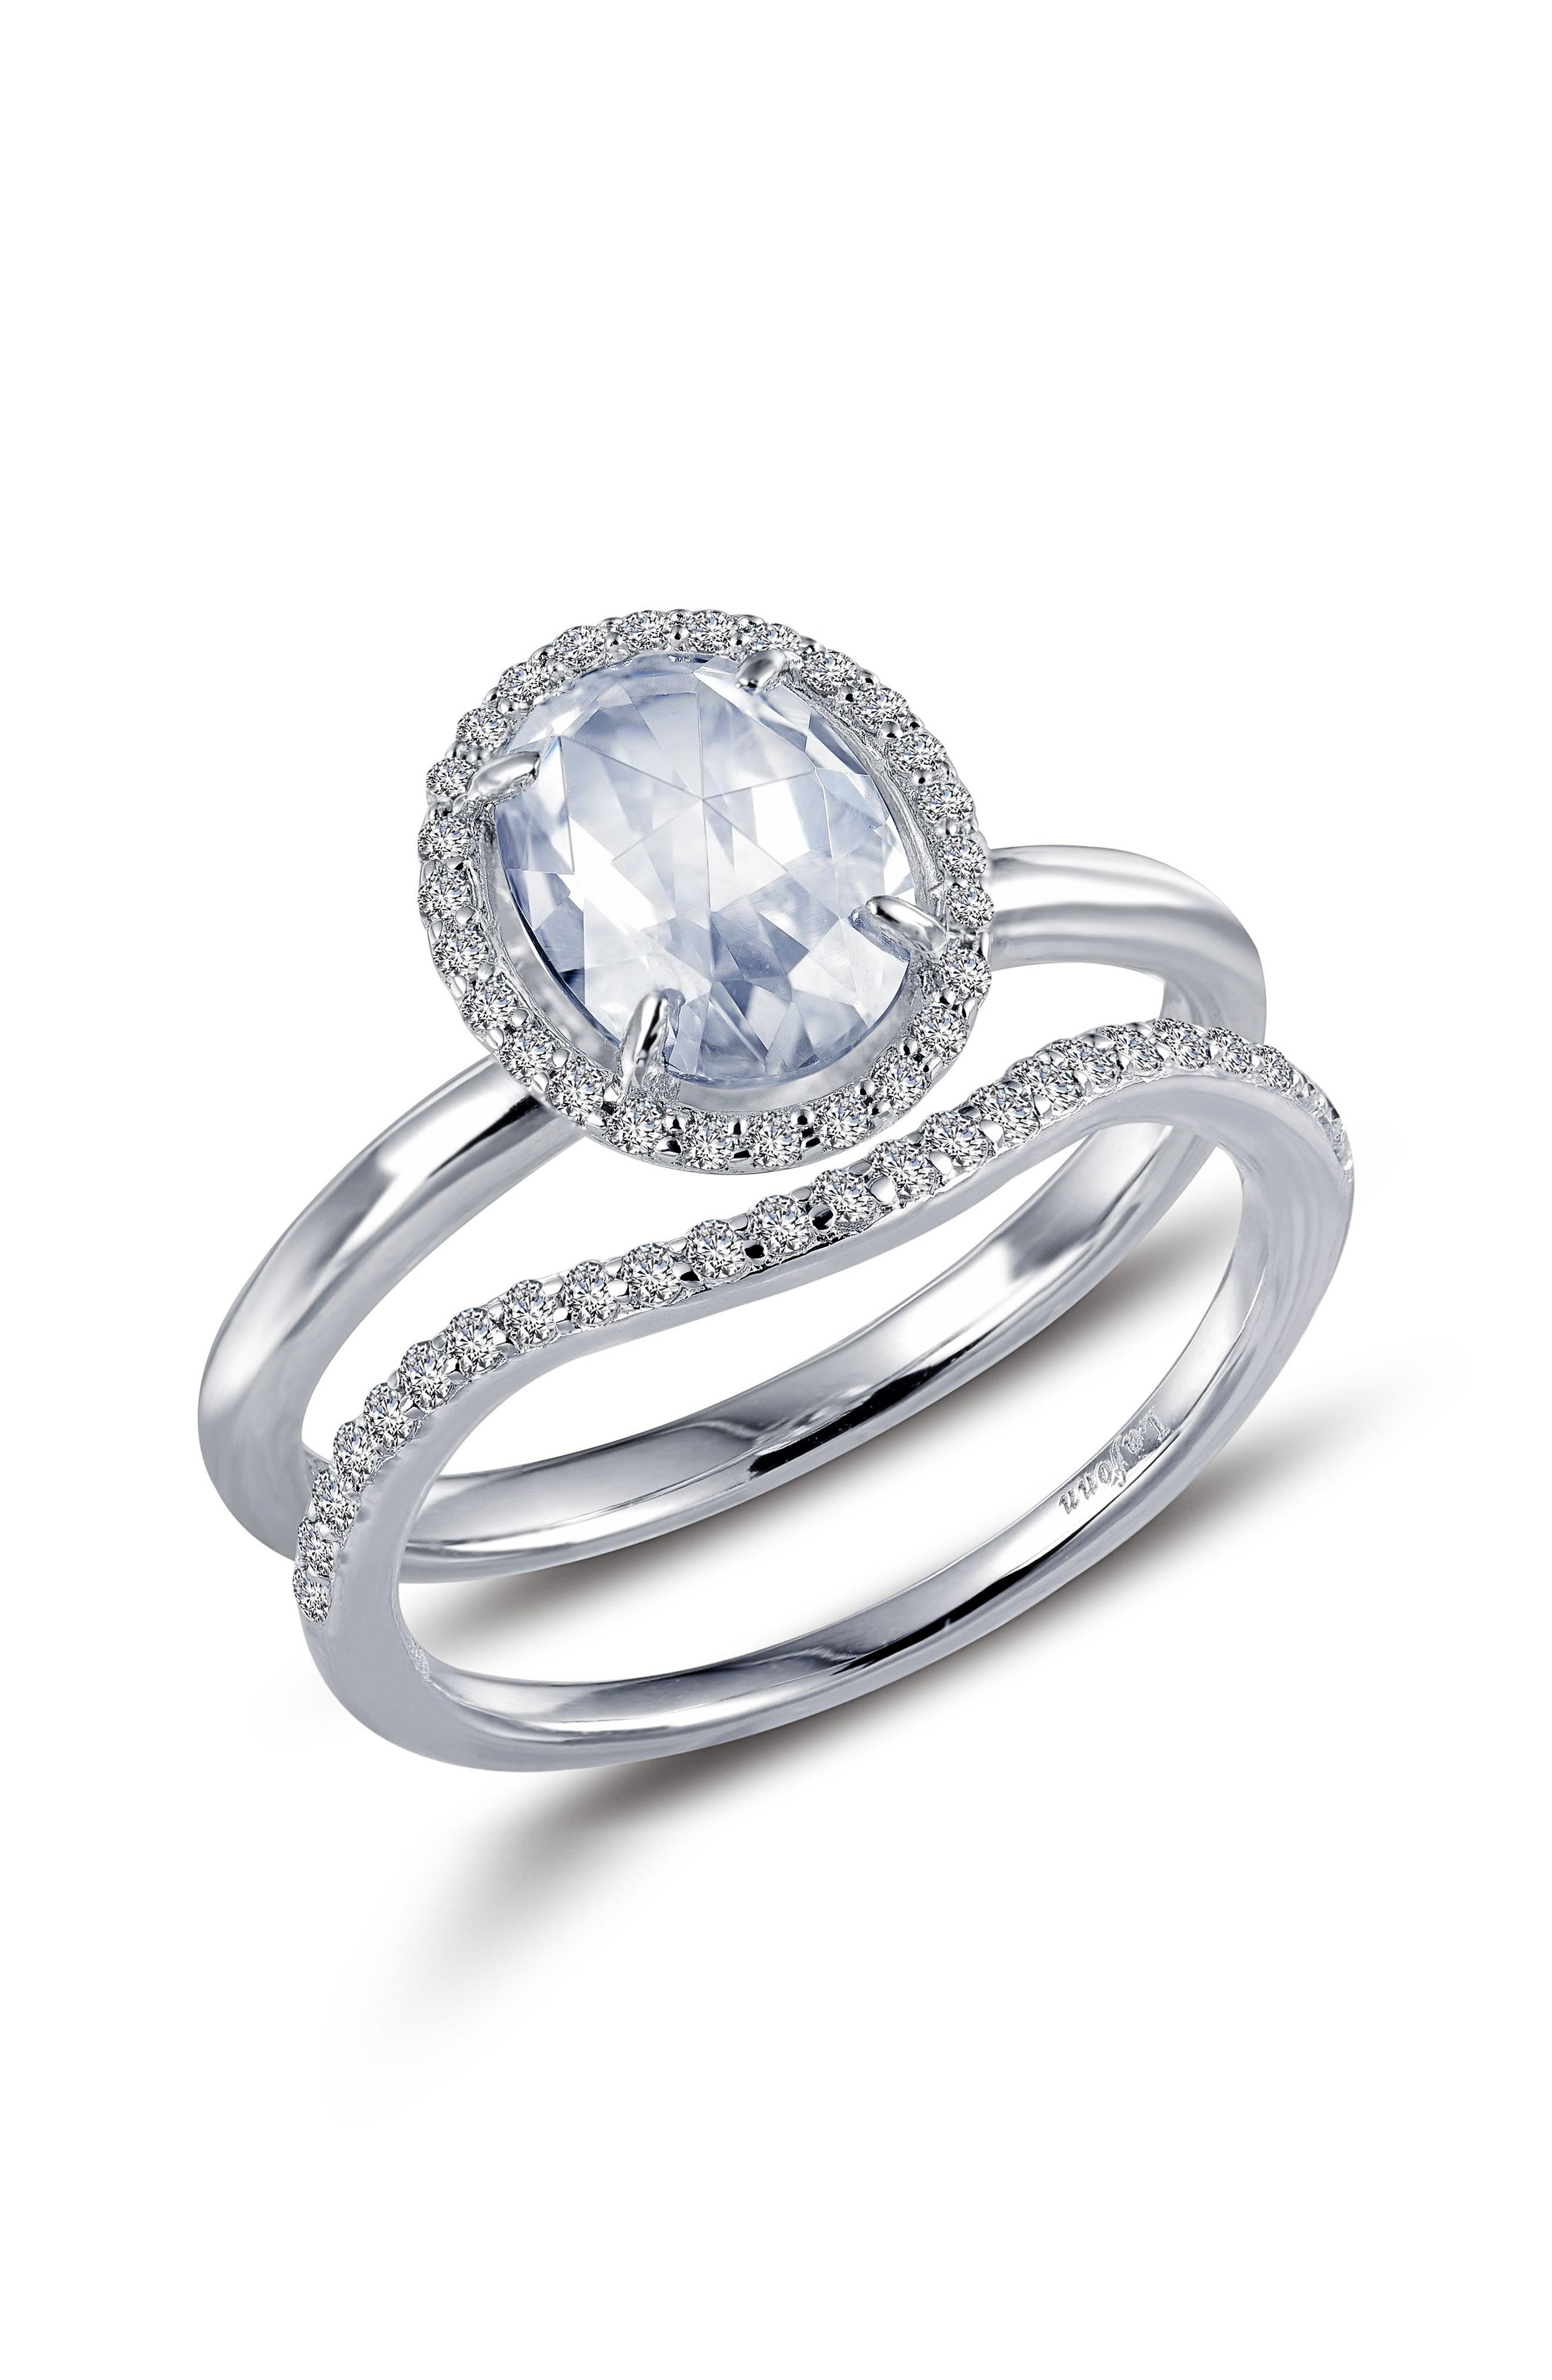 Rose Cut Simulated Diamond Ring,                             Main thumbnail 1, color,